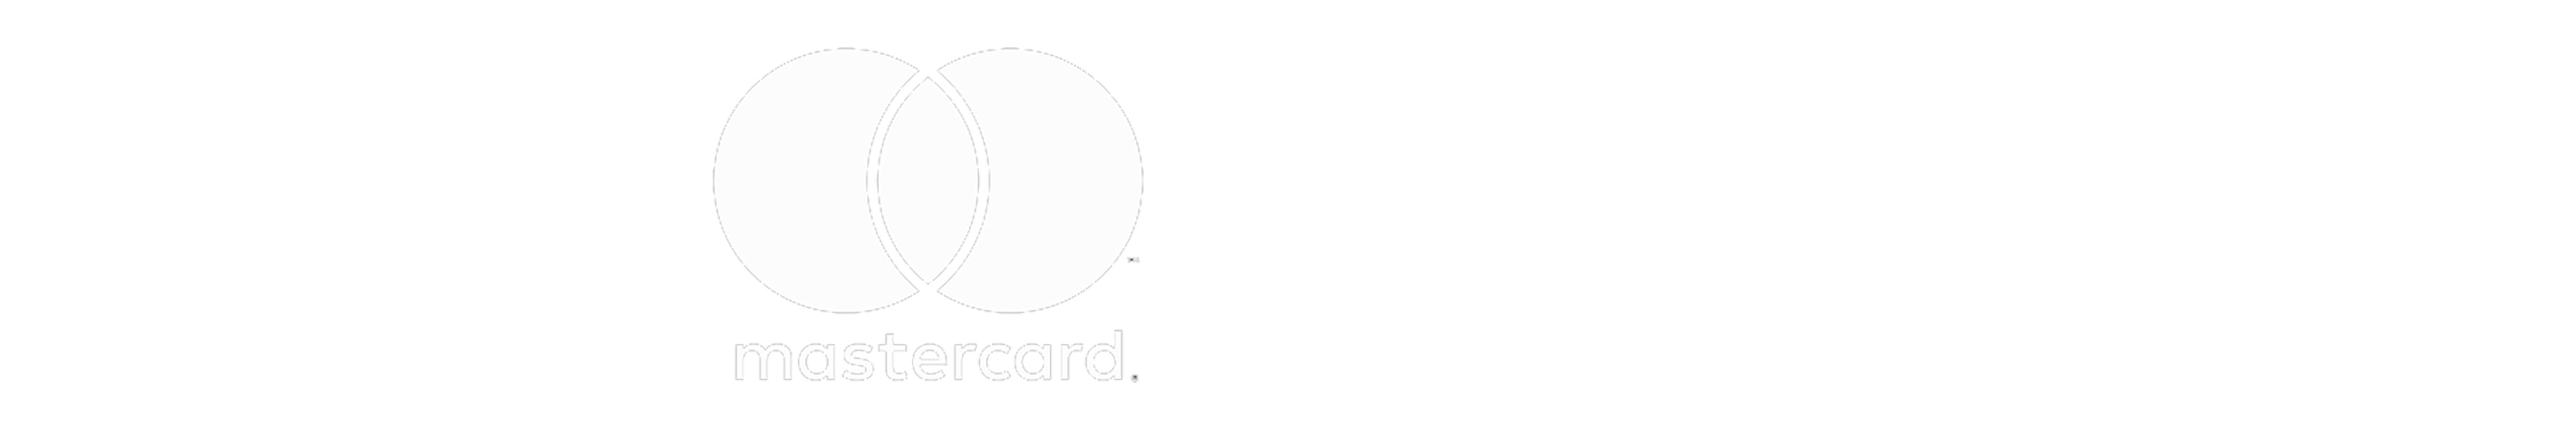 Visa Mastercard Amex Diners